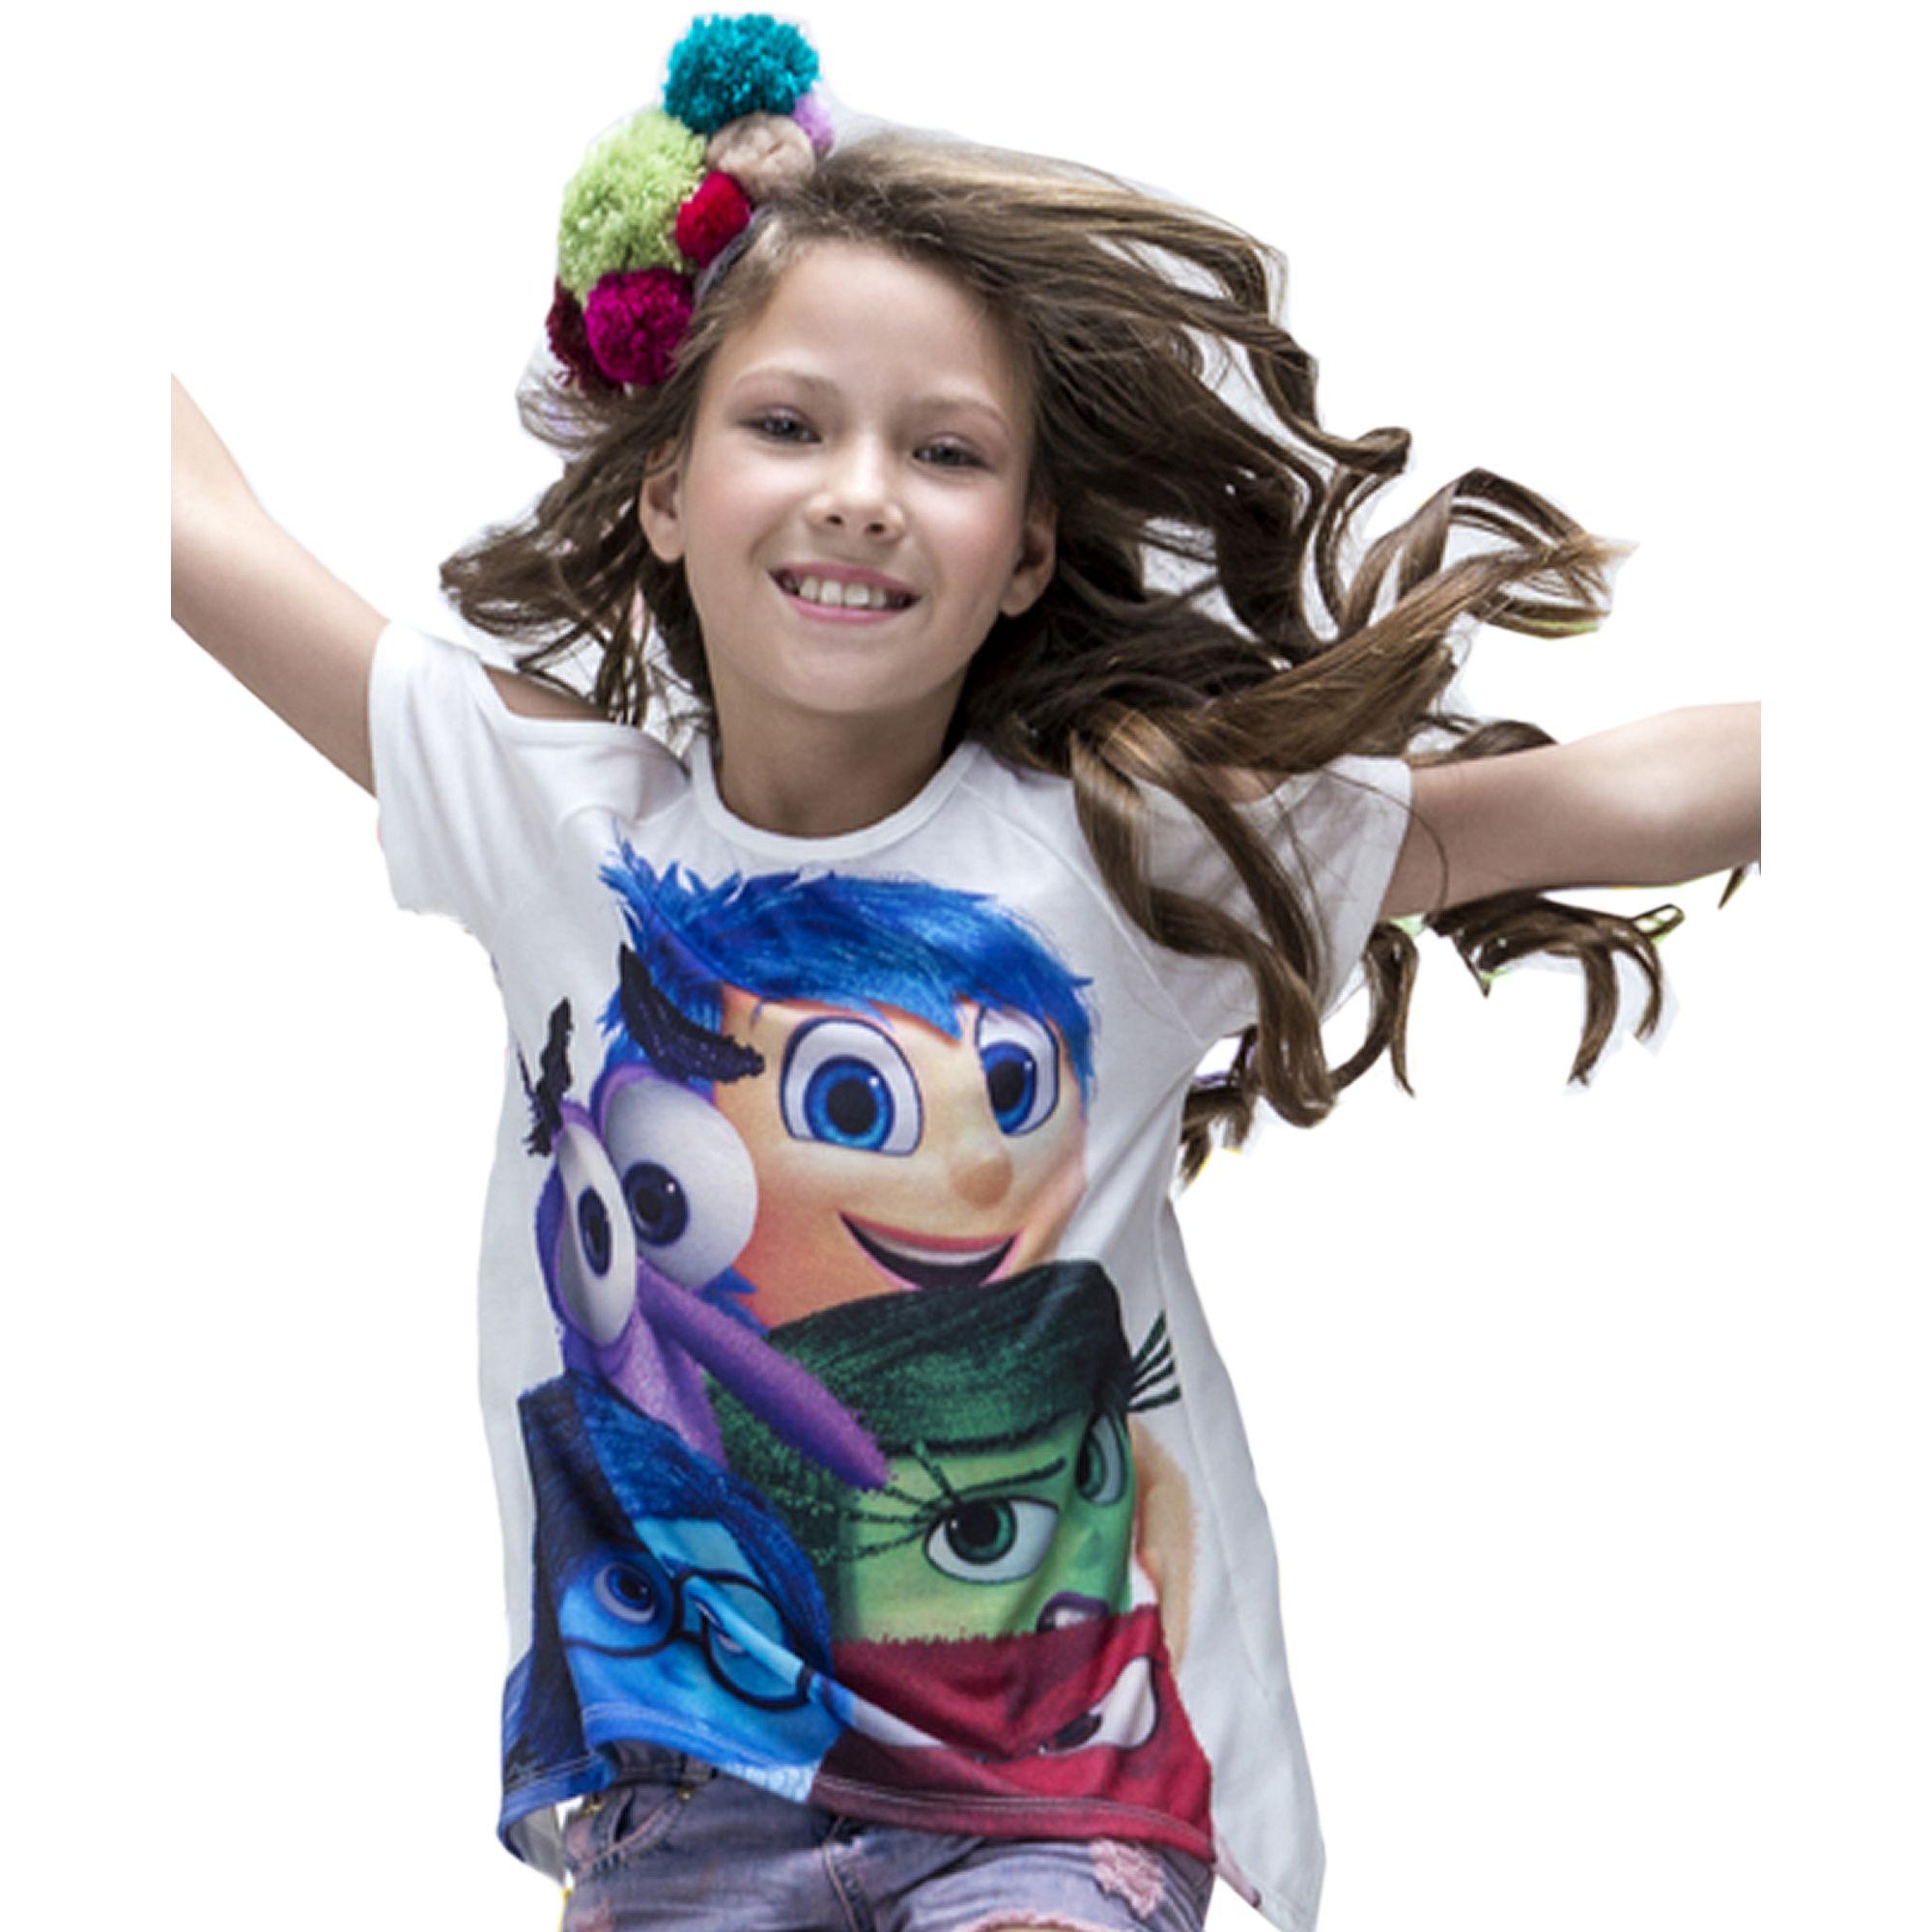 camiseta-divertida-mente-ombros-de-fora-joy-by-morena-rosa